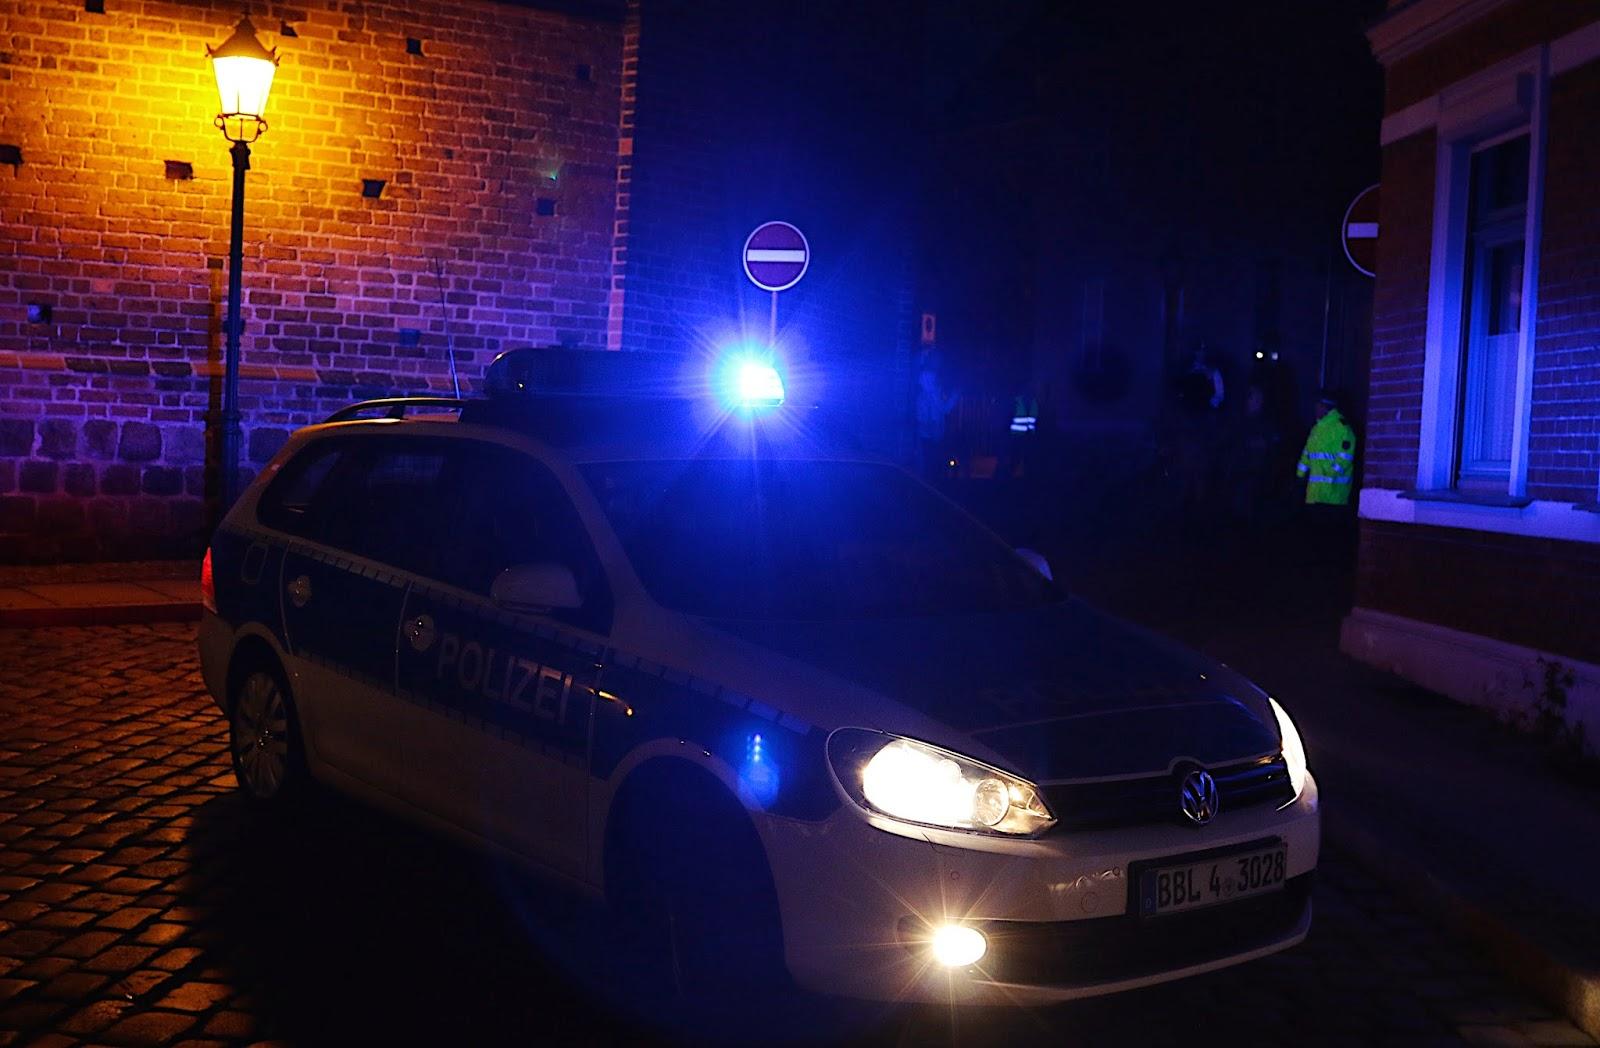 Bernau, Polizei Bernau, Polizeibericht, Bernau LIVE